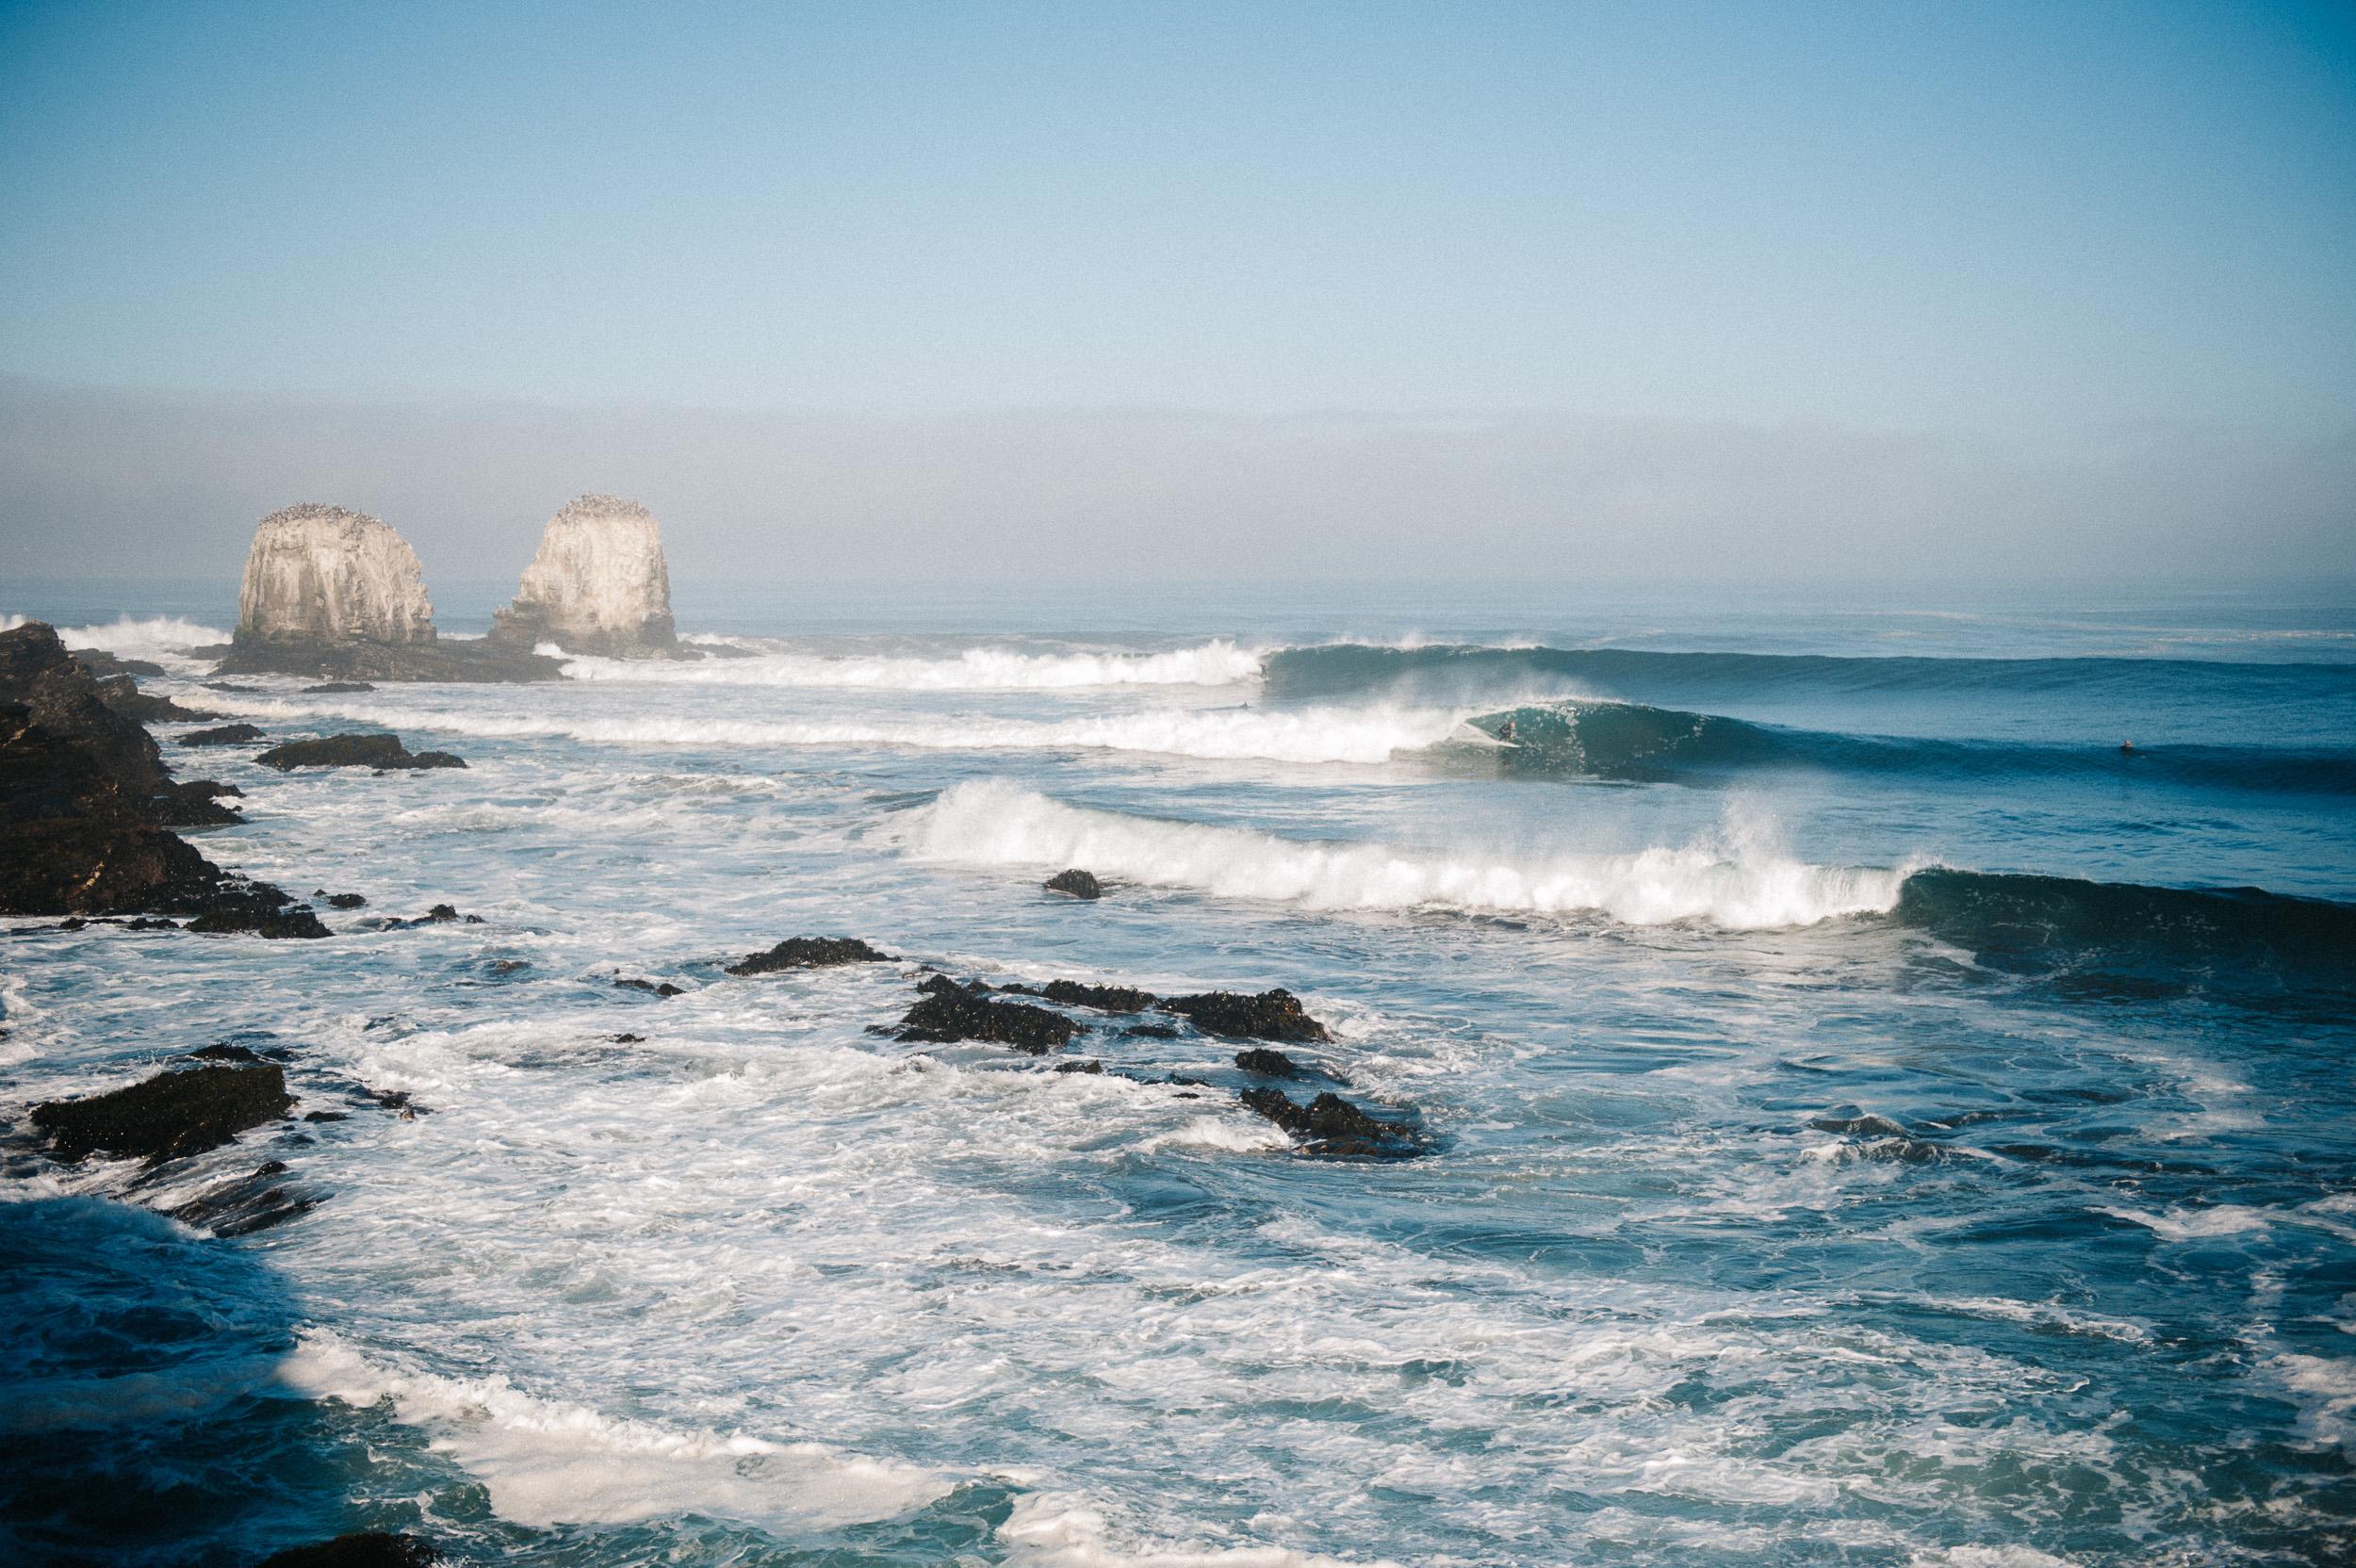 Christian-Surfers-Chile-1.jpg